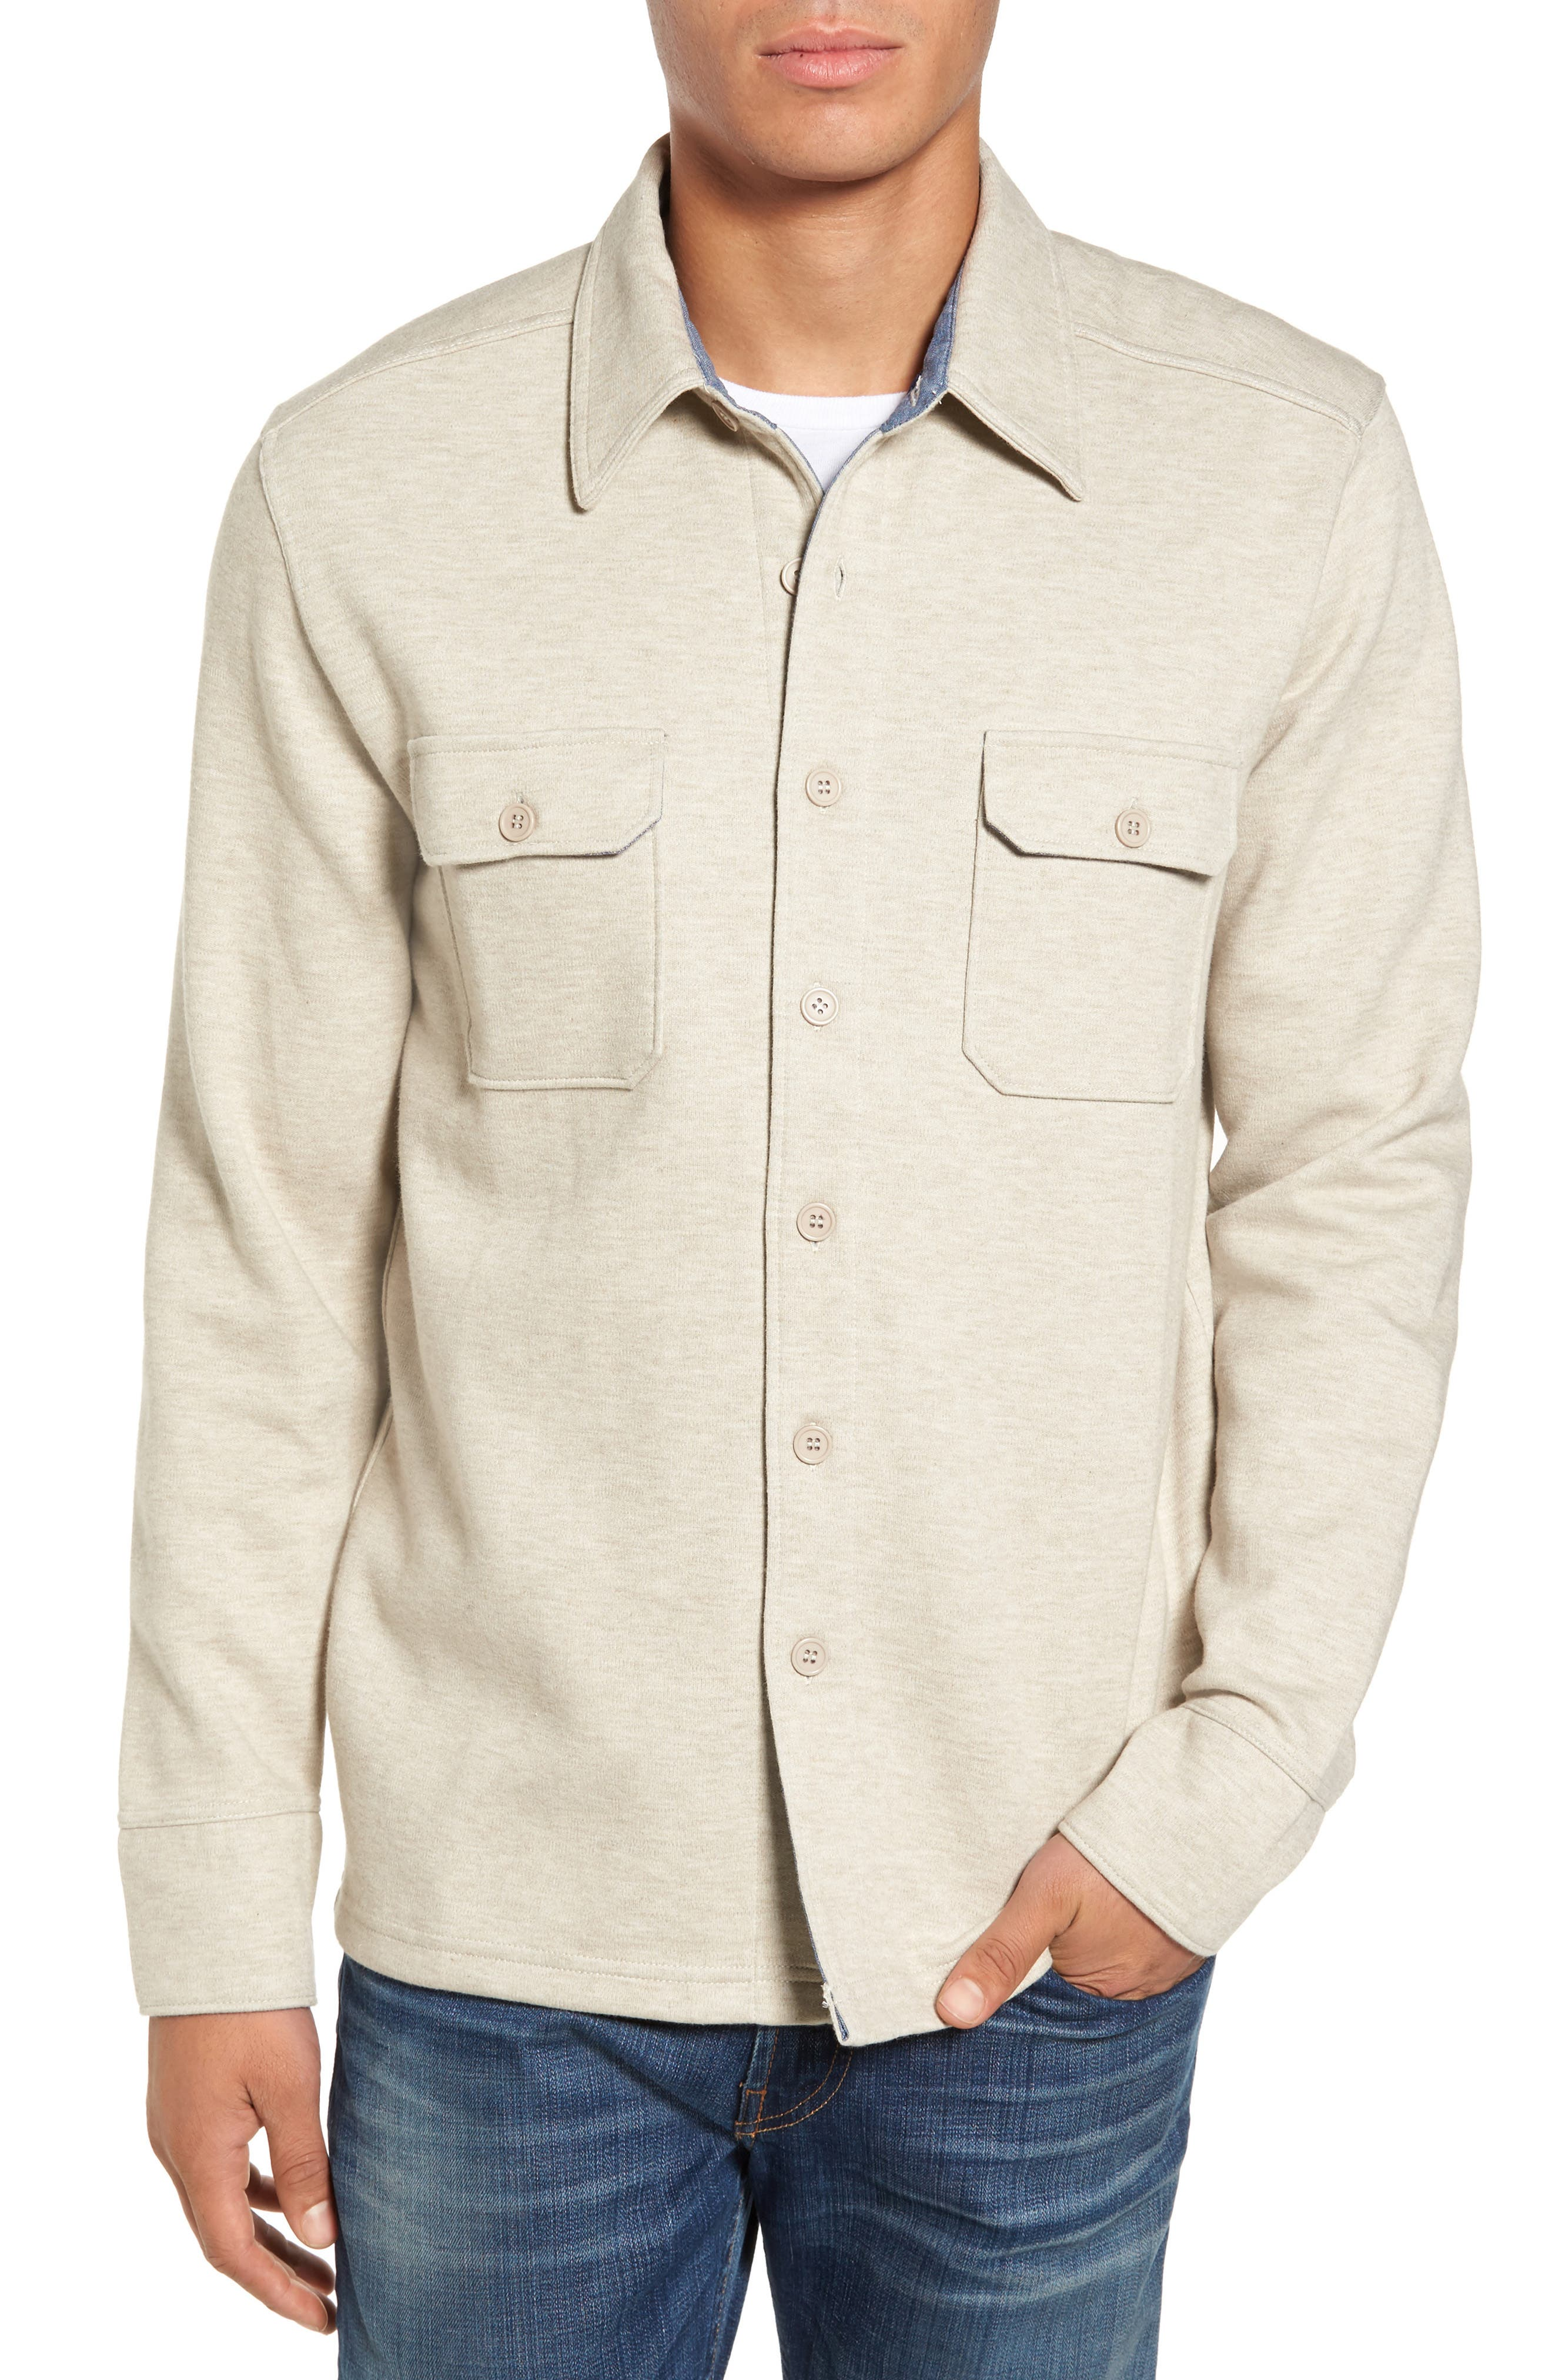 'Longitude' Flap Pocket Fleece Shirt,                         Main,                         color, Bamboo Ivory